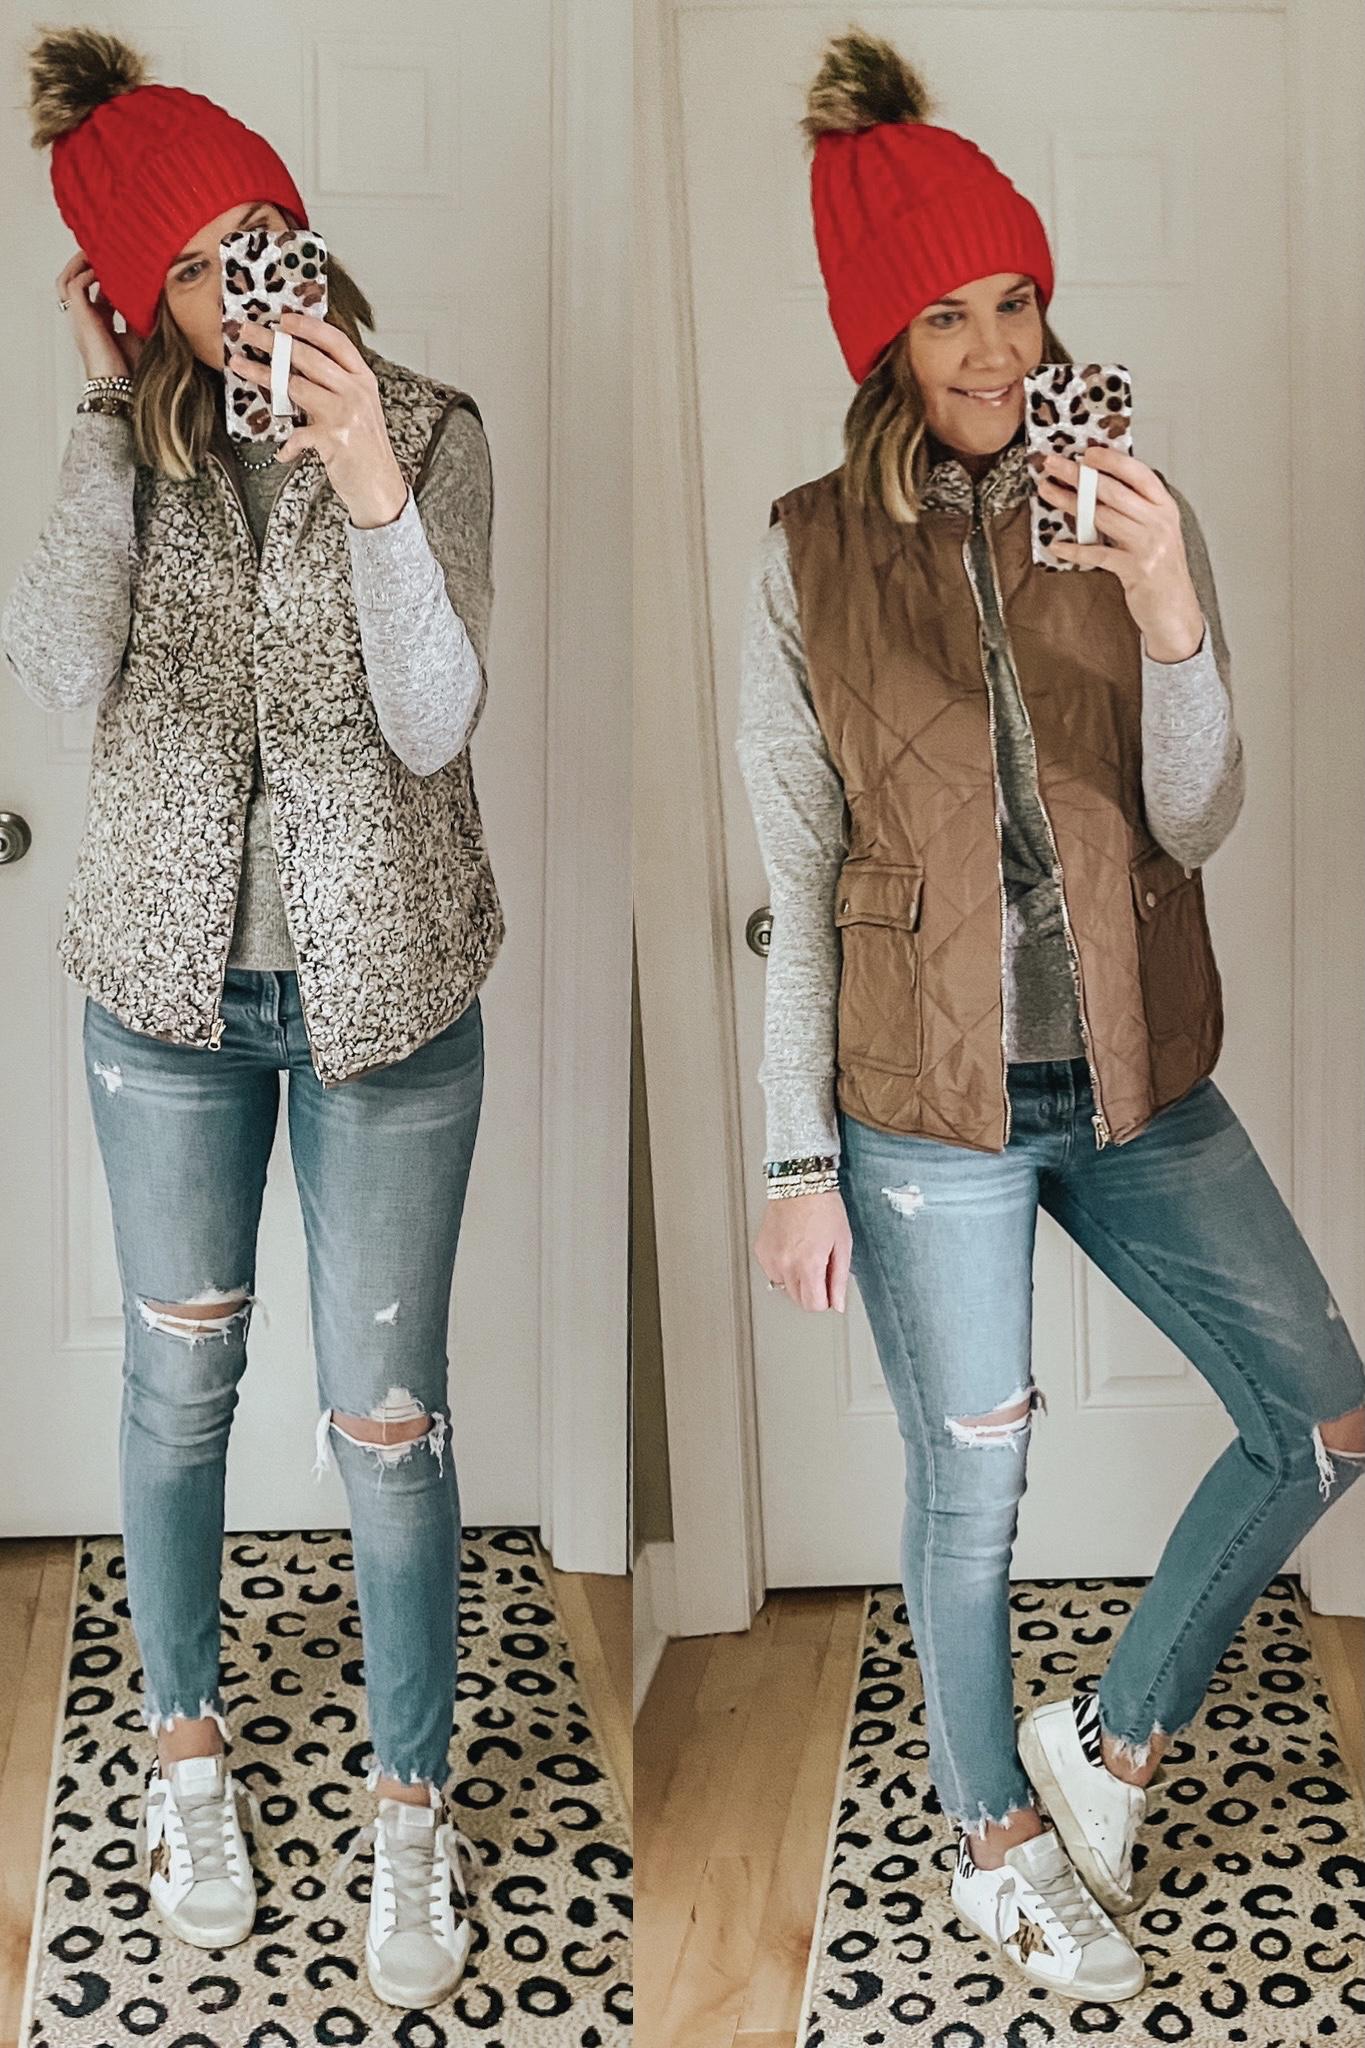 Amazon reversible vest for women, red fur pompom beanie